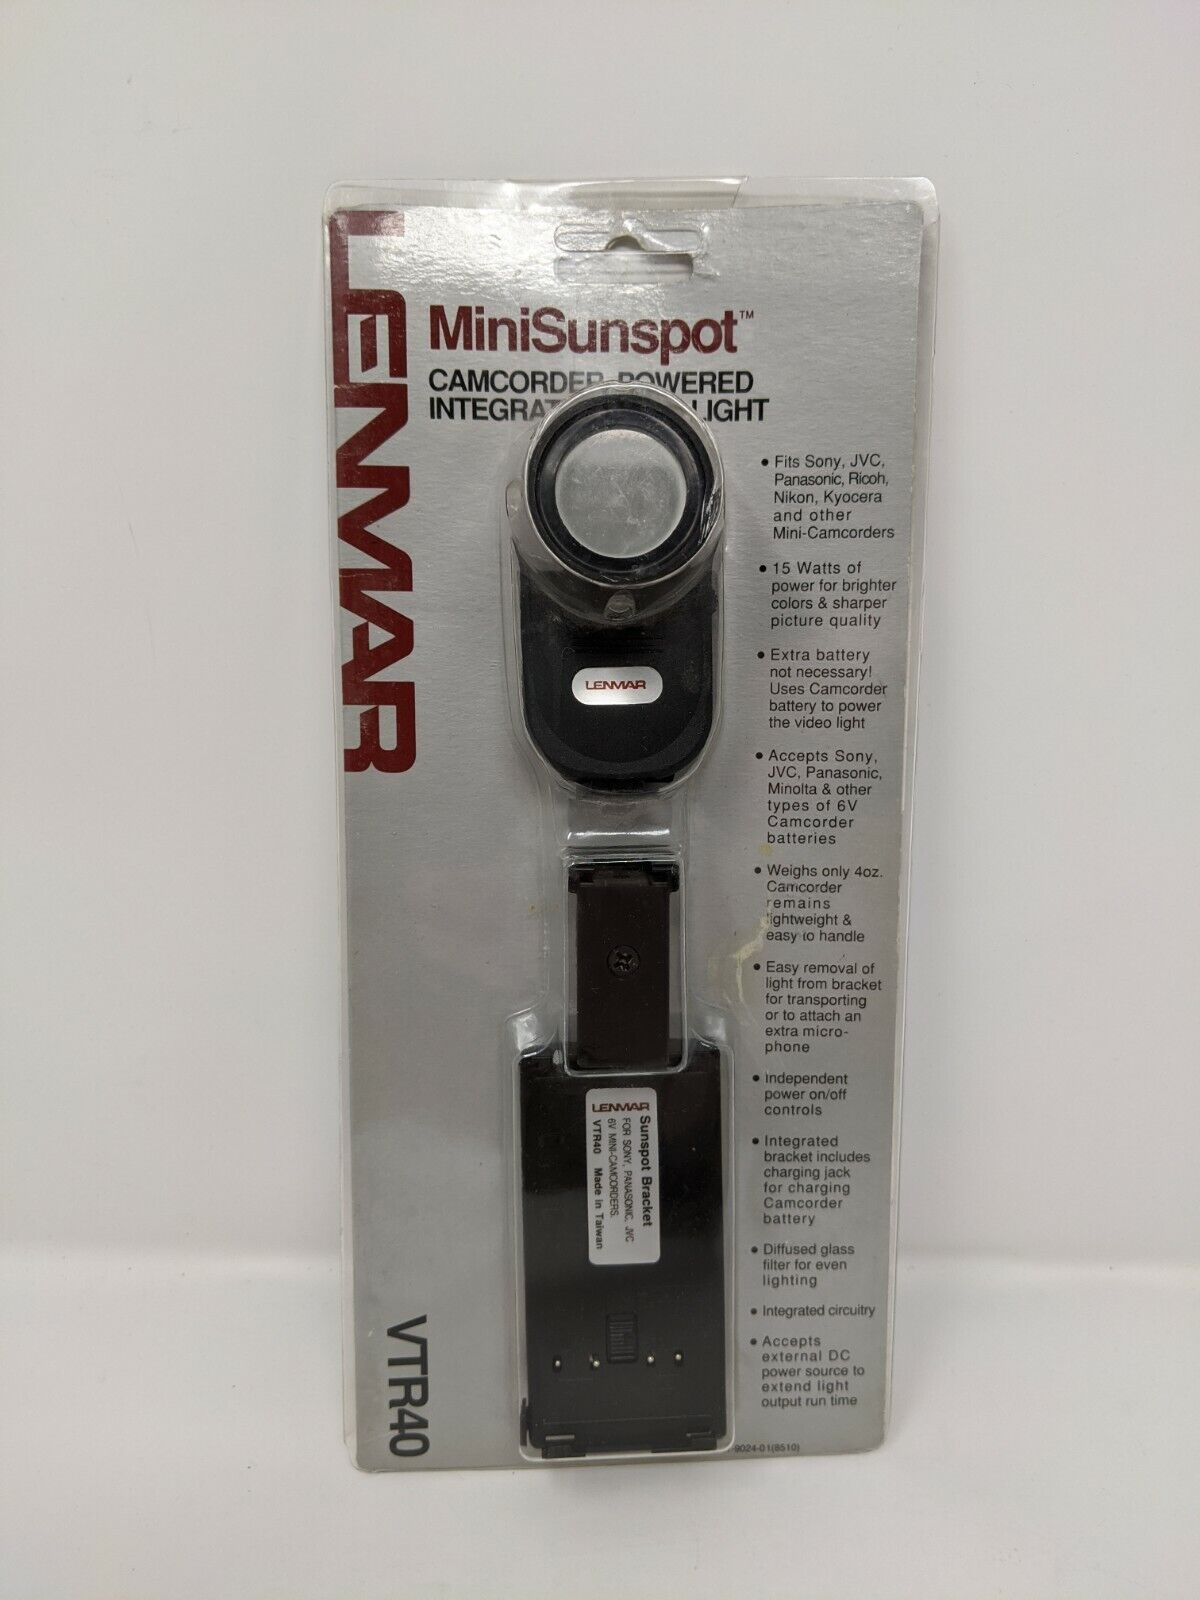 Lenmar MiniSunspot Camcorder-Powered Integrated Video Light VTR40